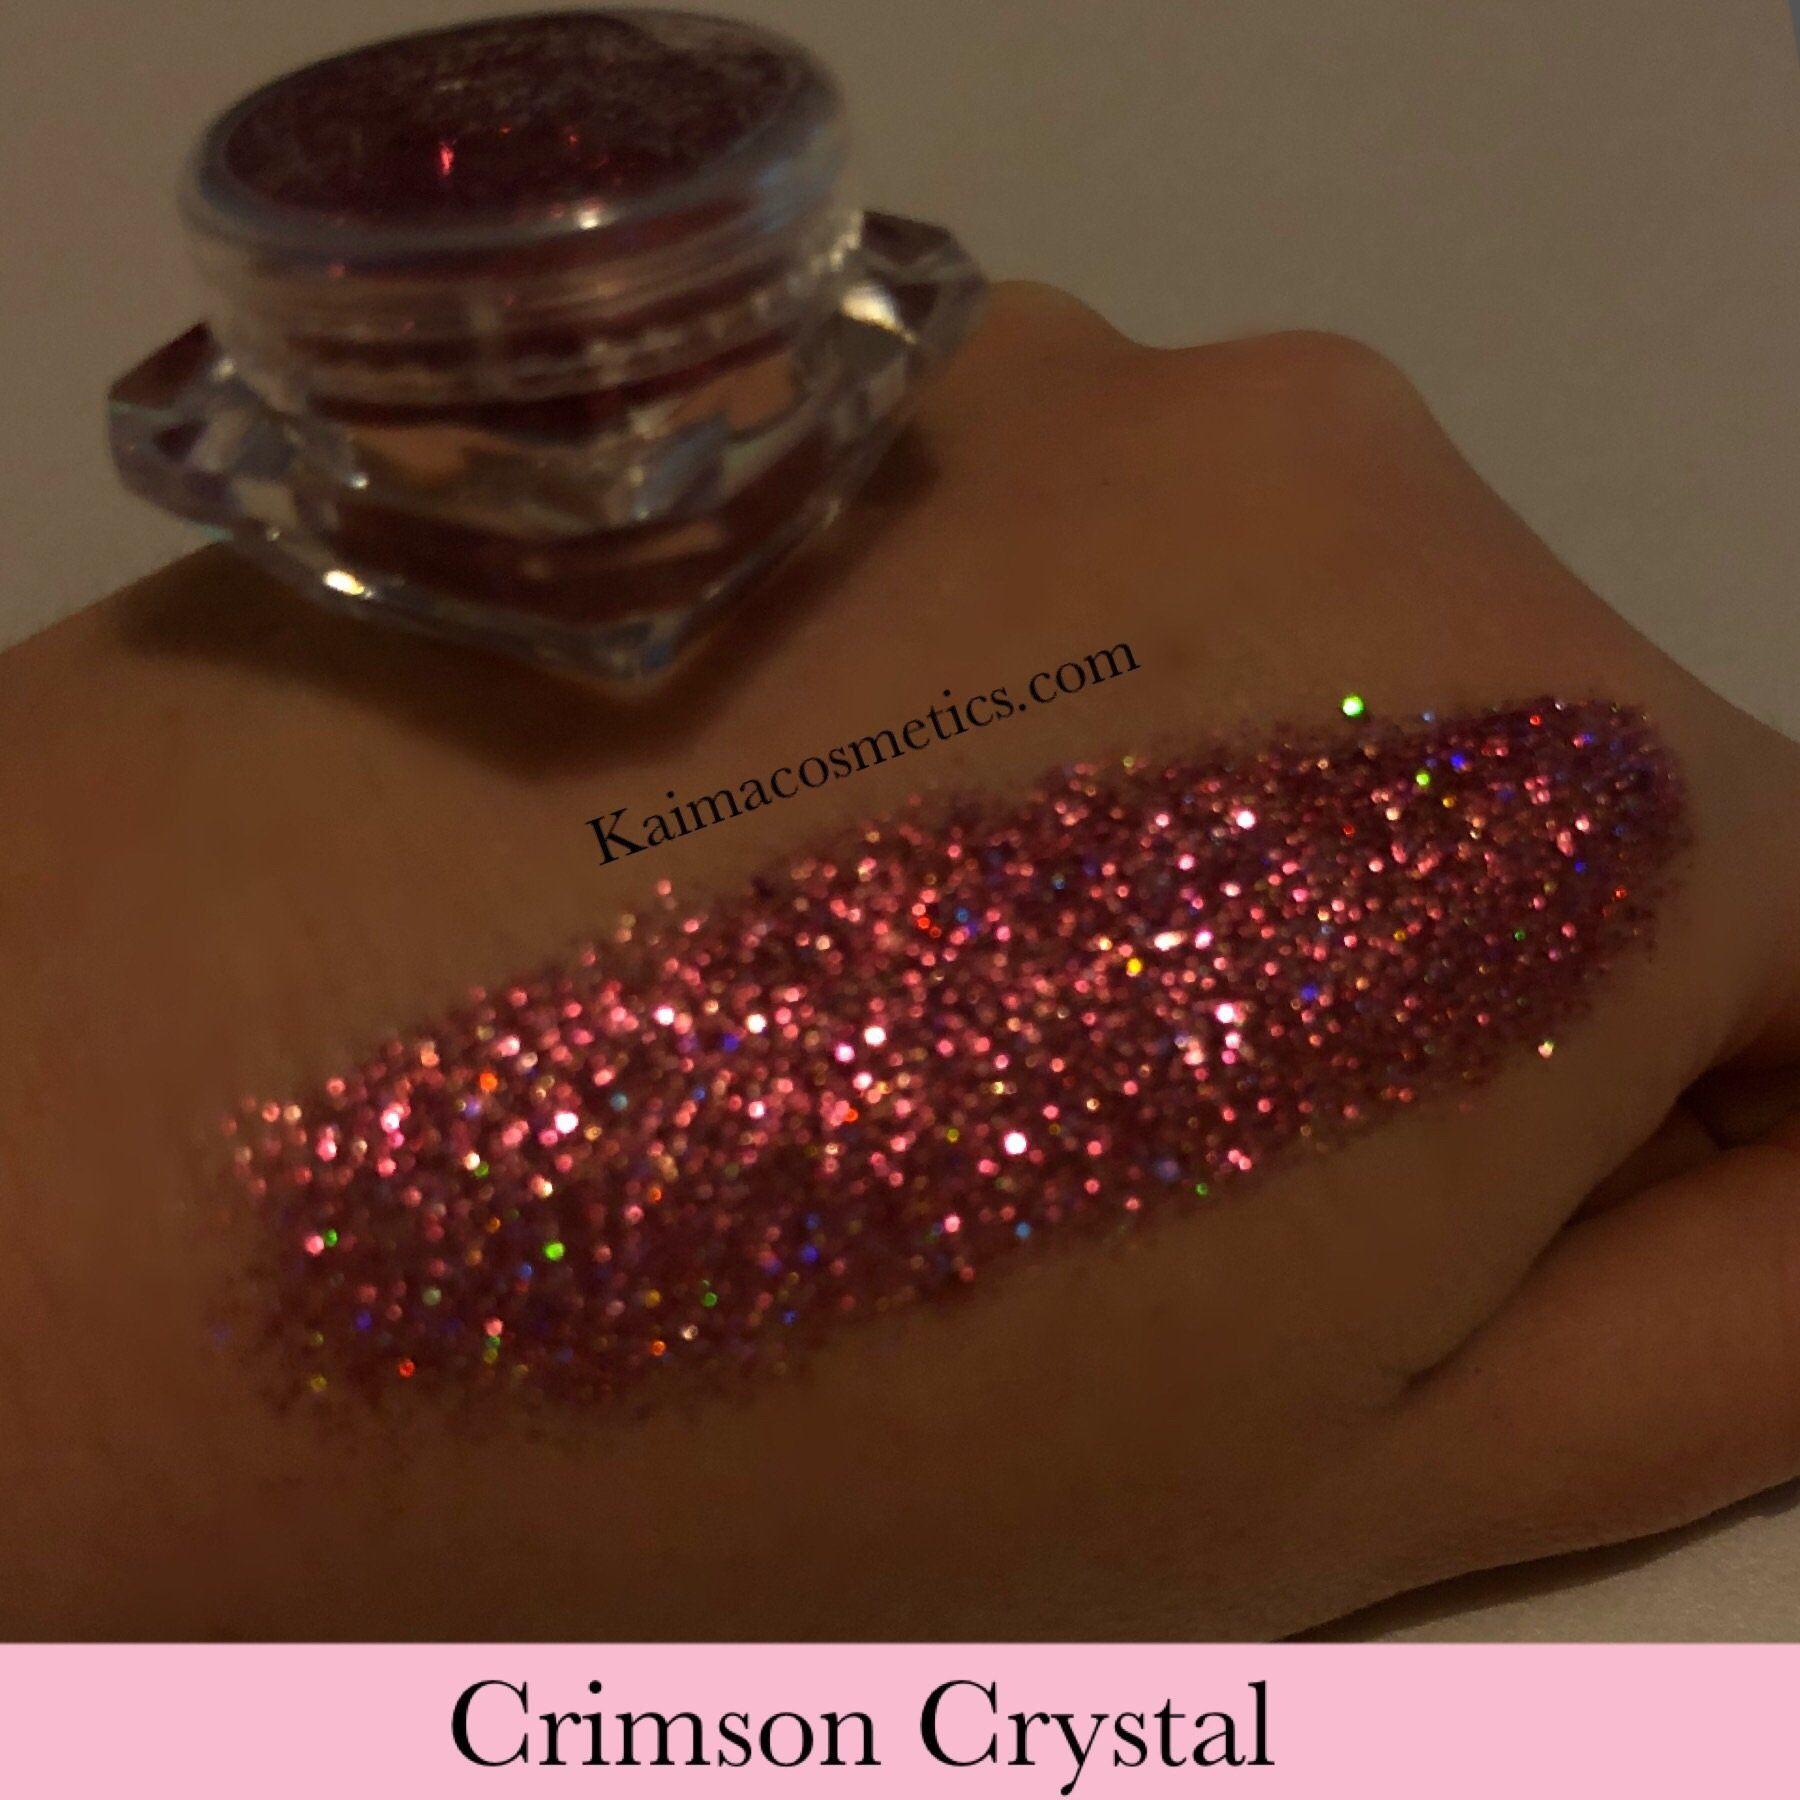 Loose glitter Crimson crystal ⭐️⭐️⭐️⭐️⭐️ Buy cruelty